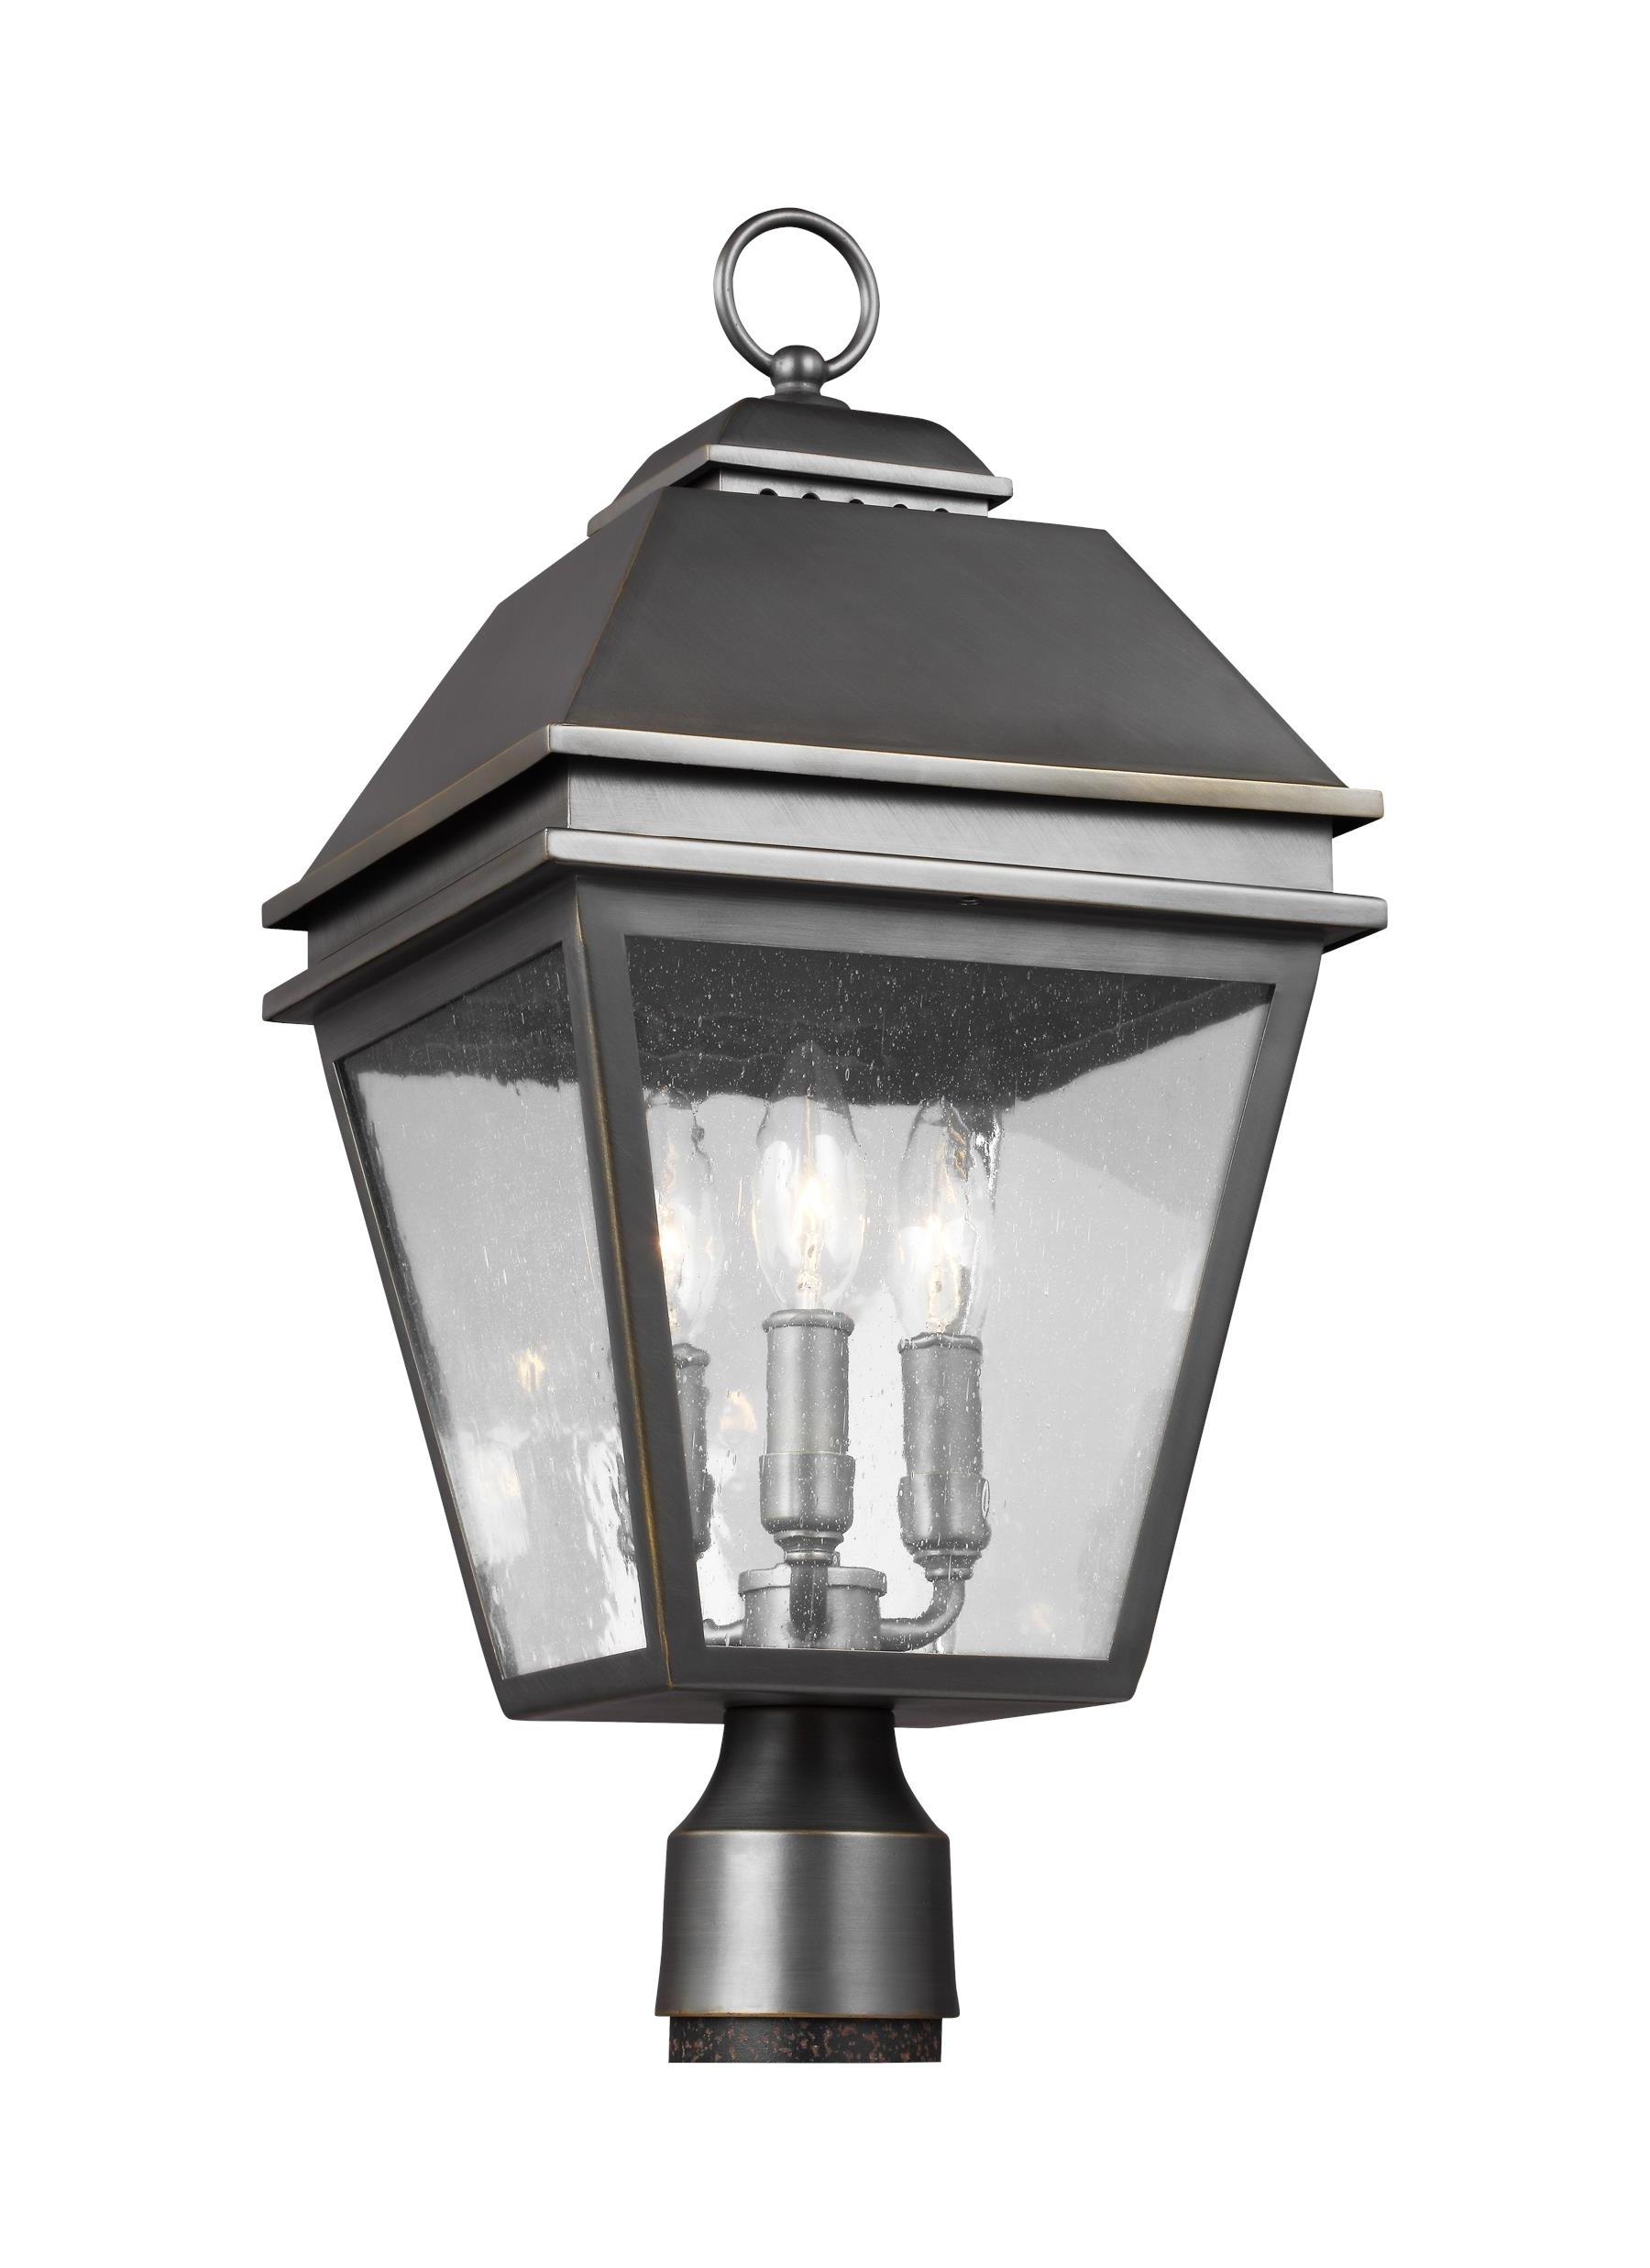 Ol13507Anbz,3 – Light Outdoor Post Lantern,antique Bronze Regarding Newest Antique Outdoor Lanterns (View 10 of 20)